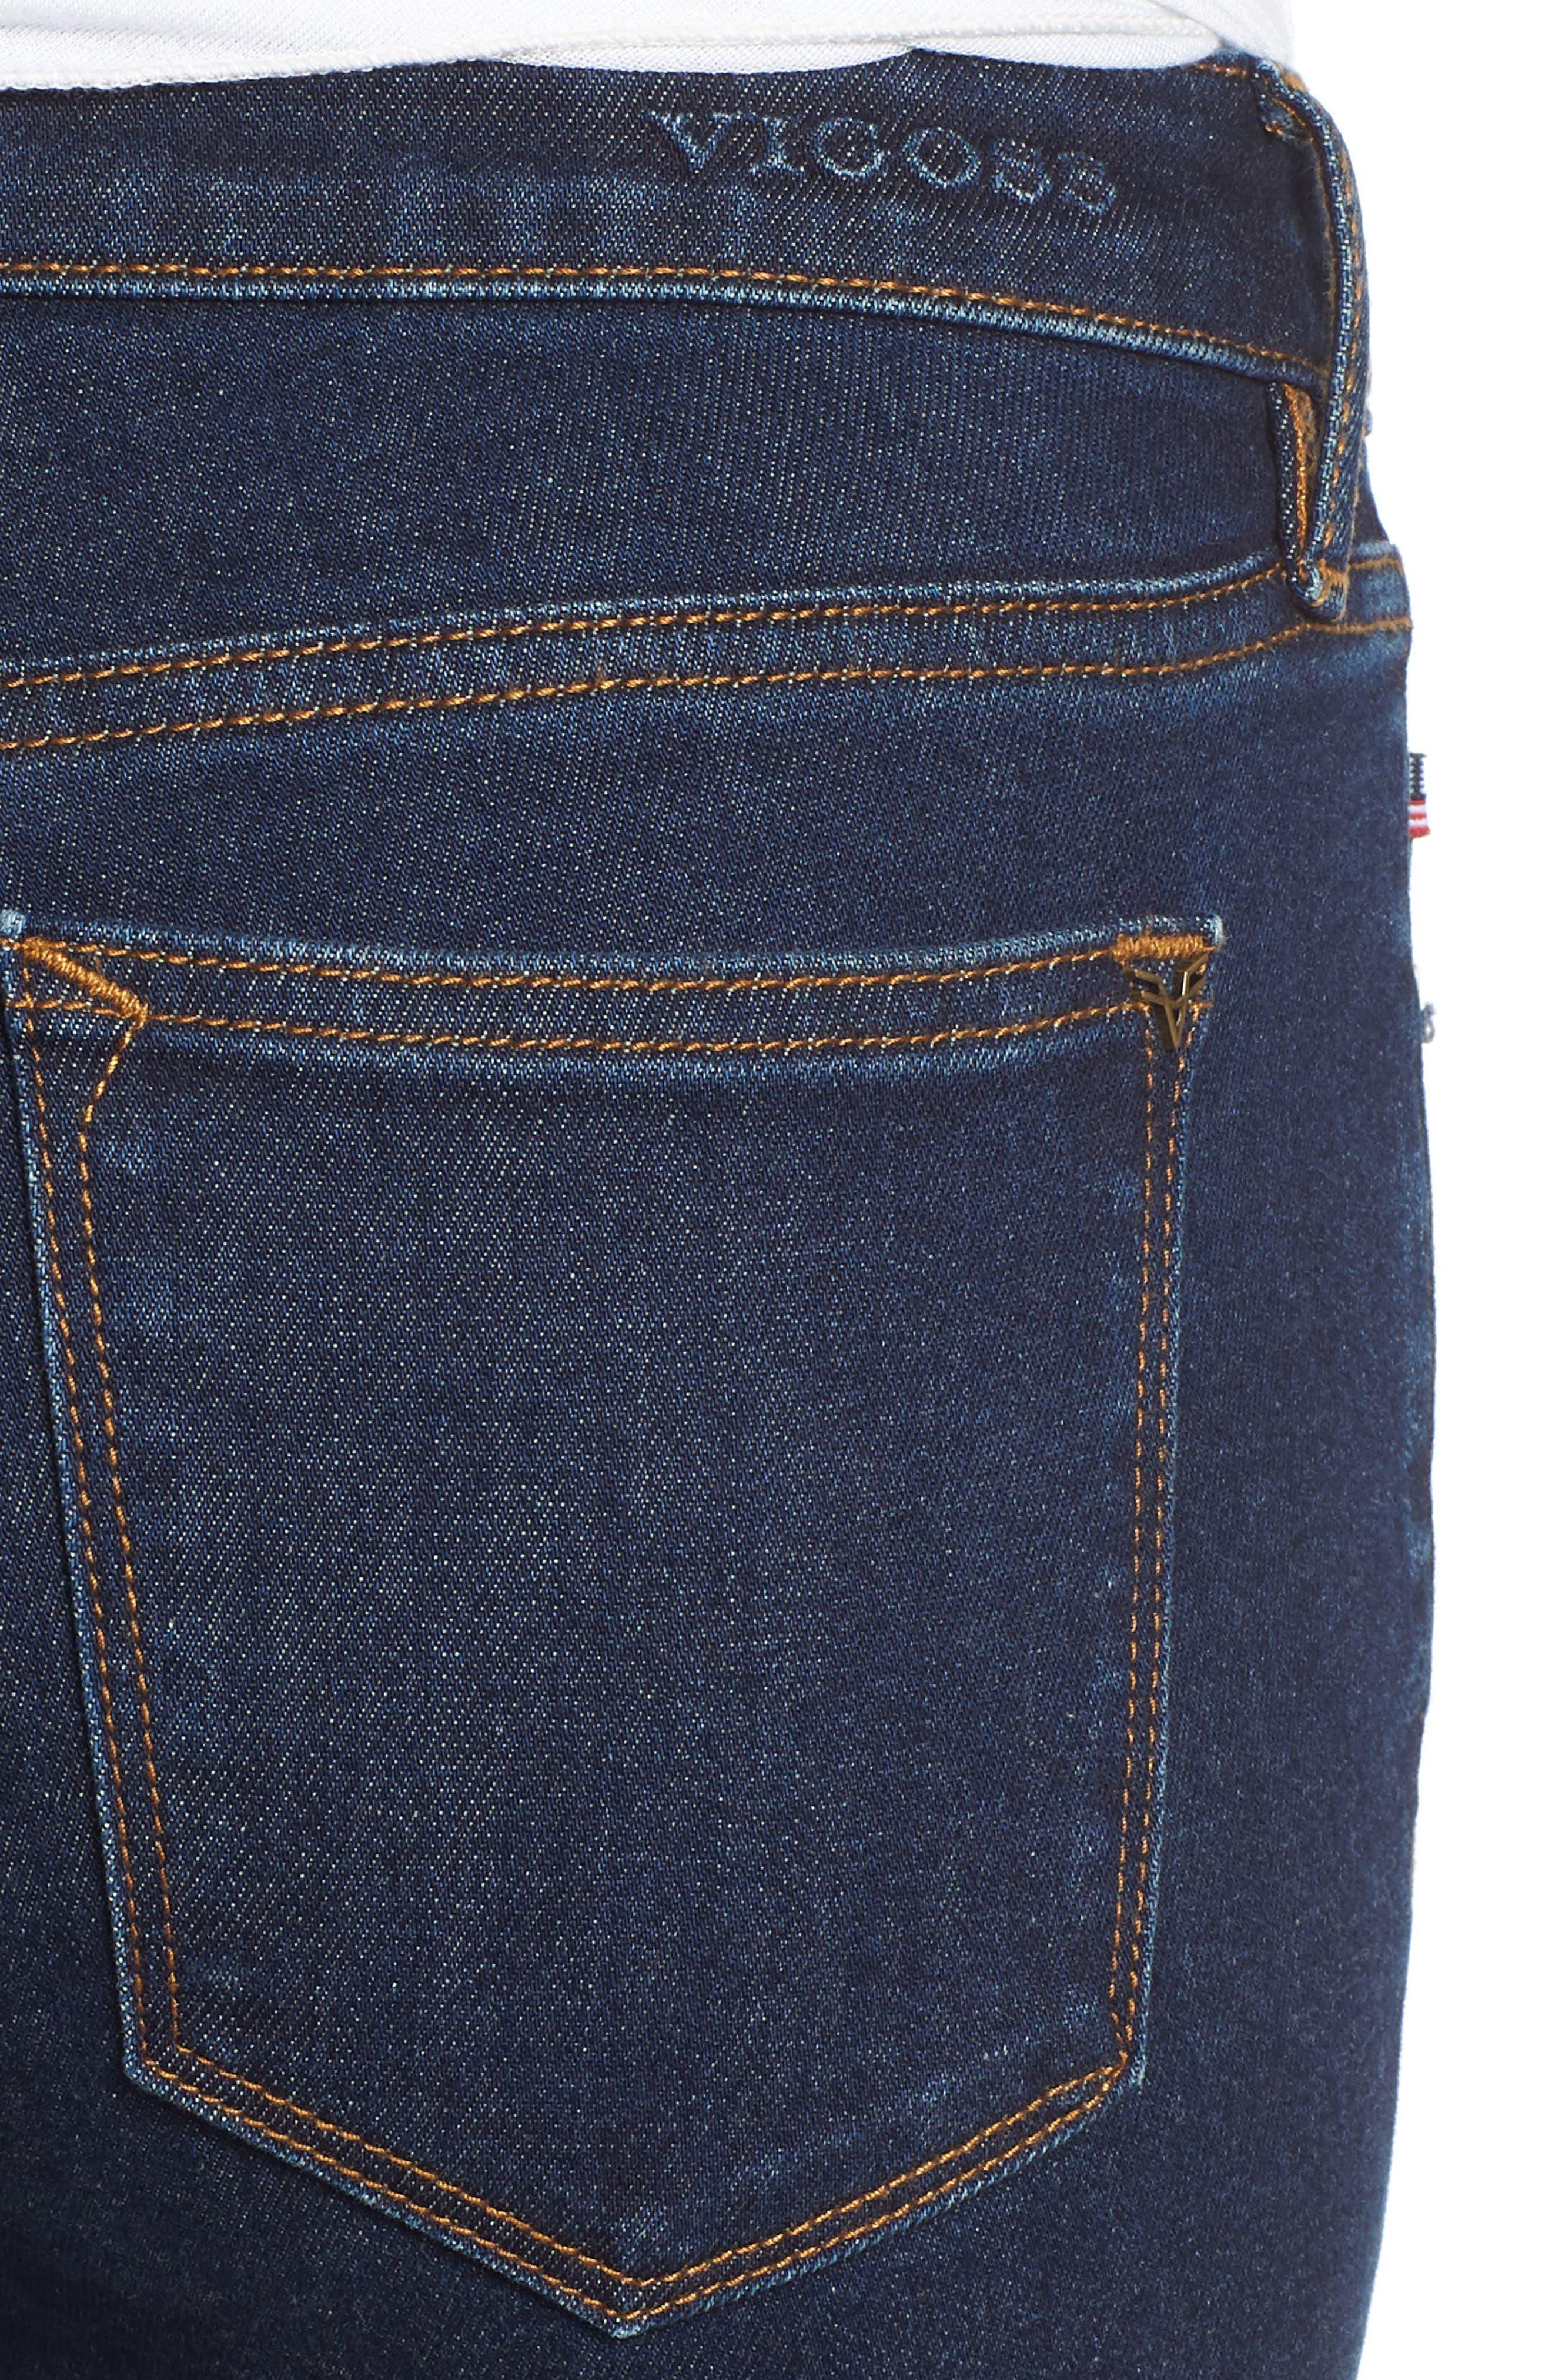 Jagger Skinny Jeans,                             Alternate thumbnail 4, color,                             DARK WASH